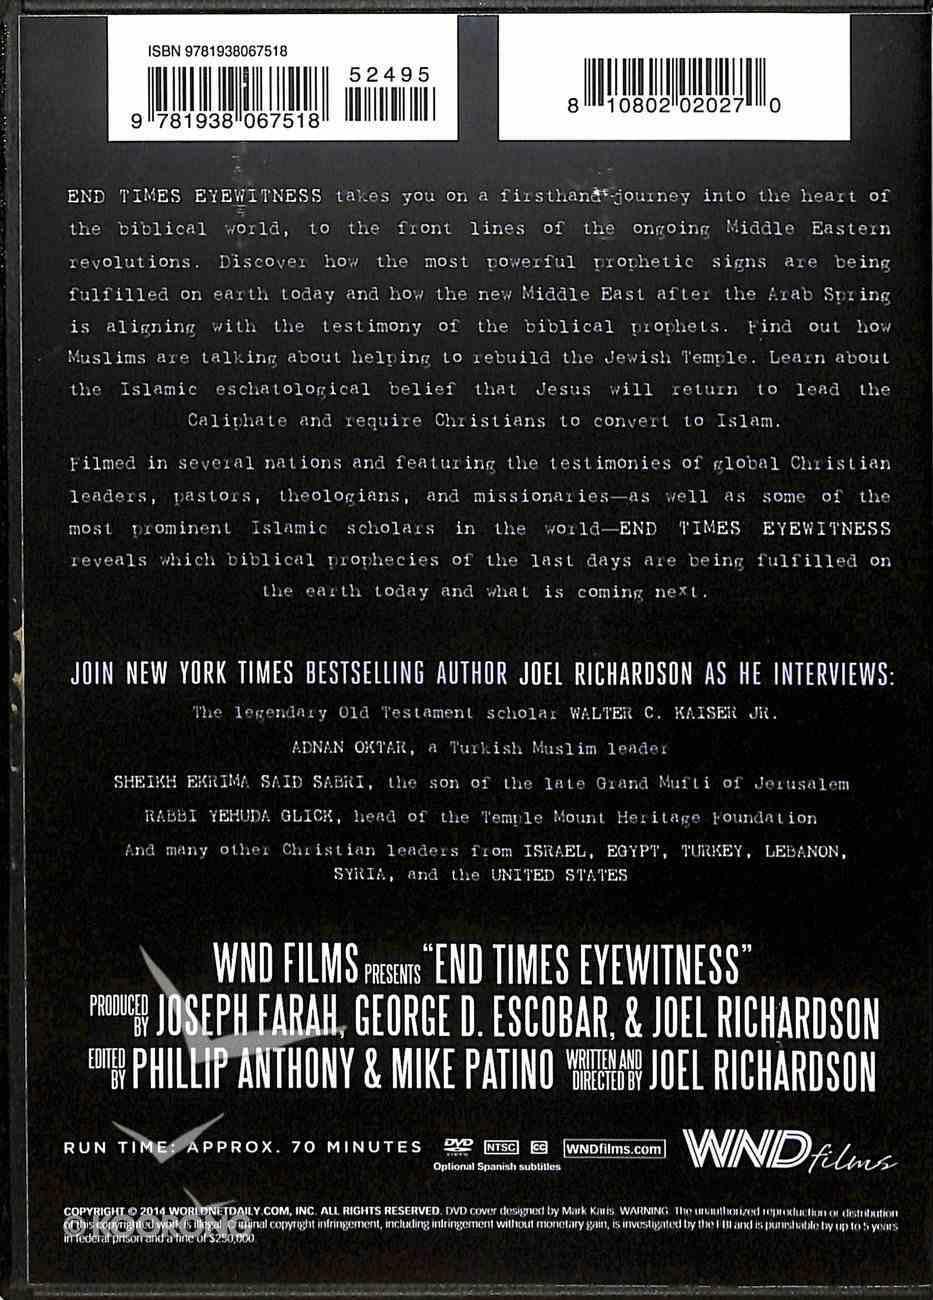 End Times Eyewitness DVD